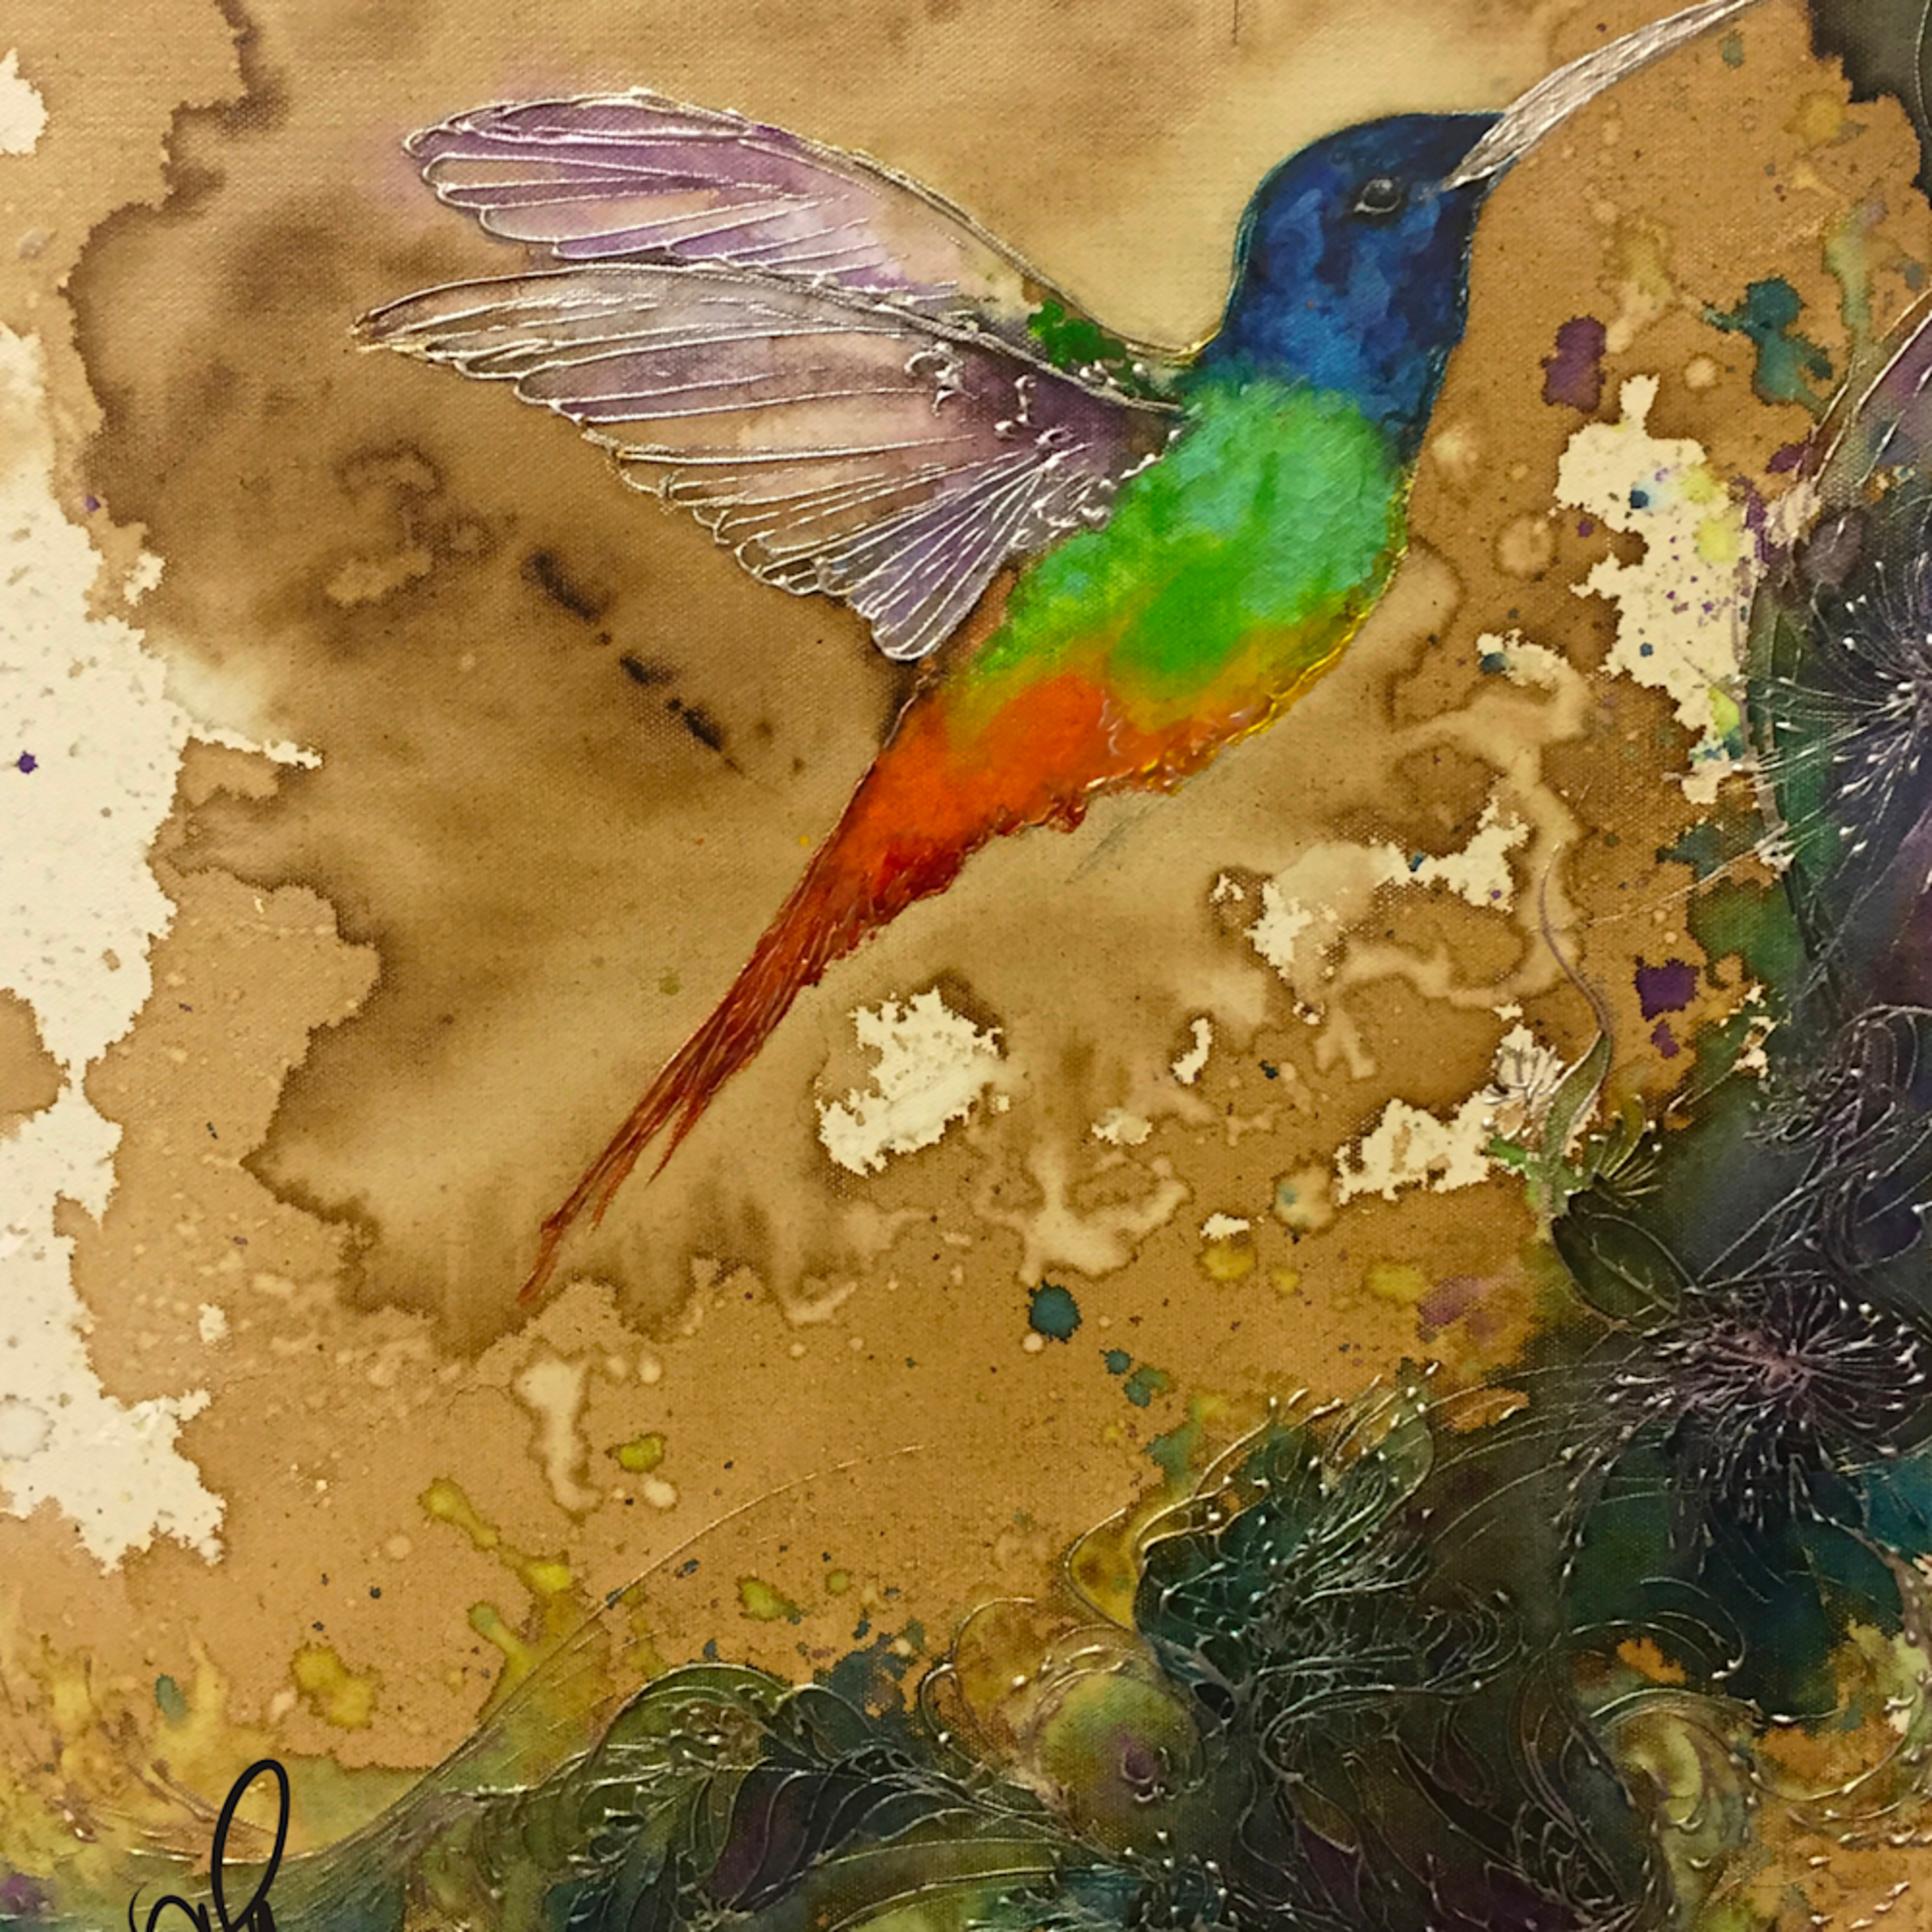 Rainbow hummingbird qfb3qk